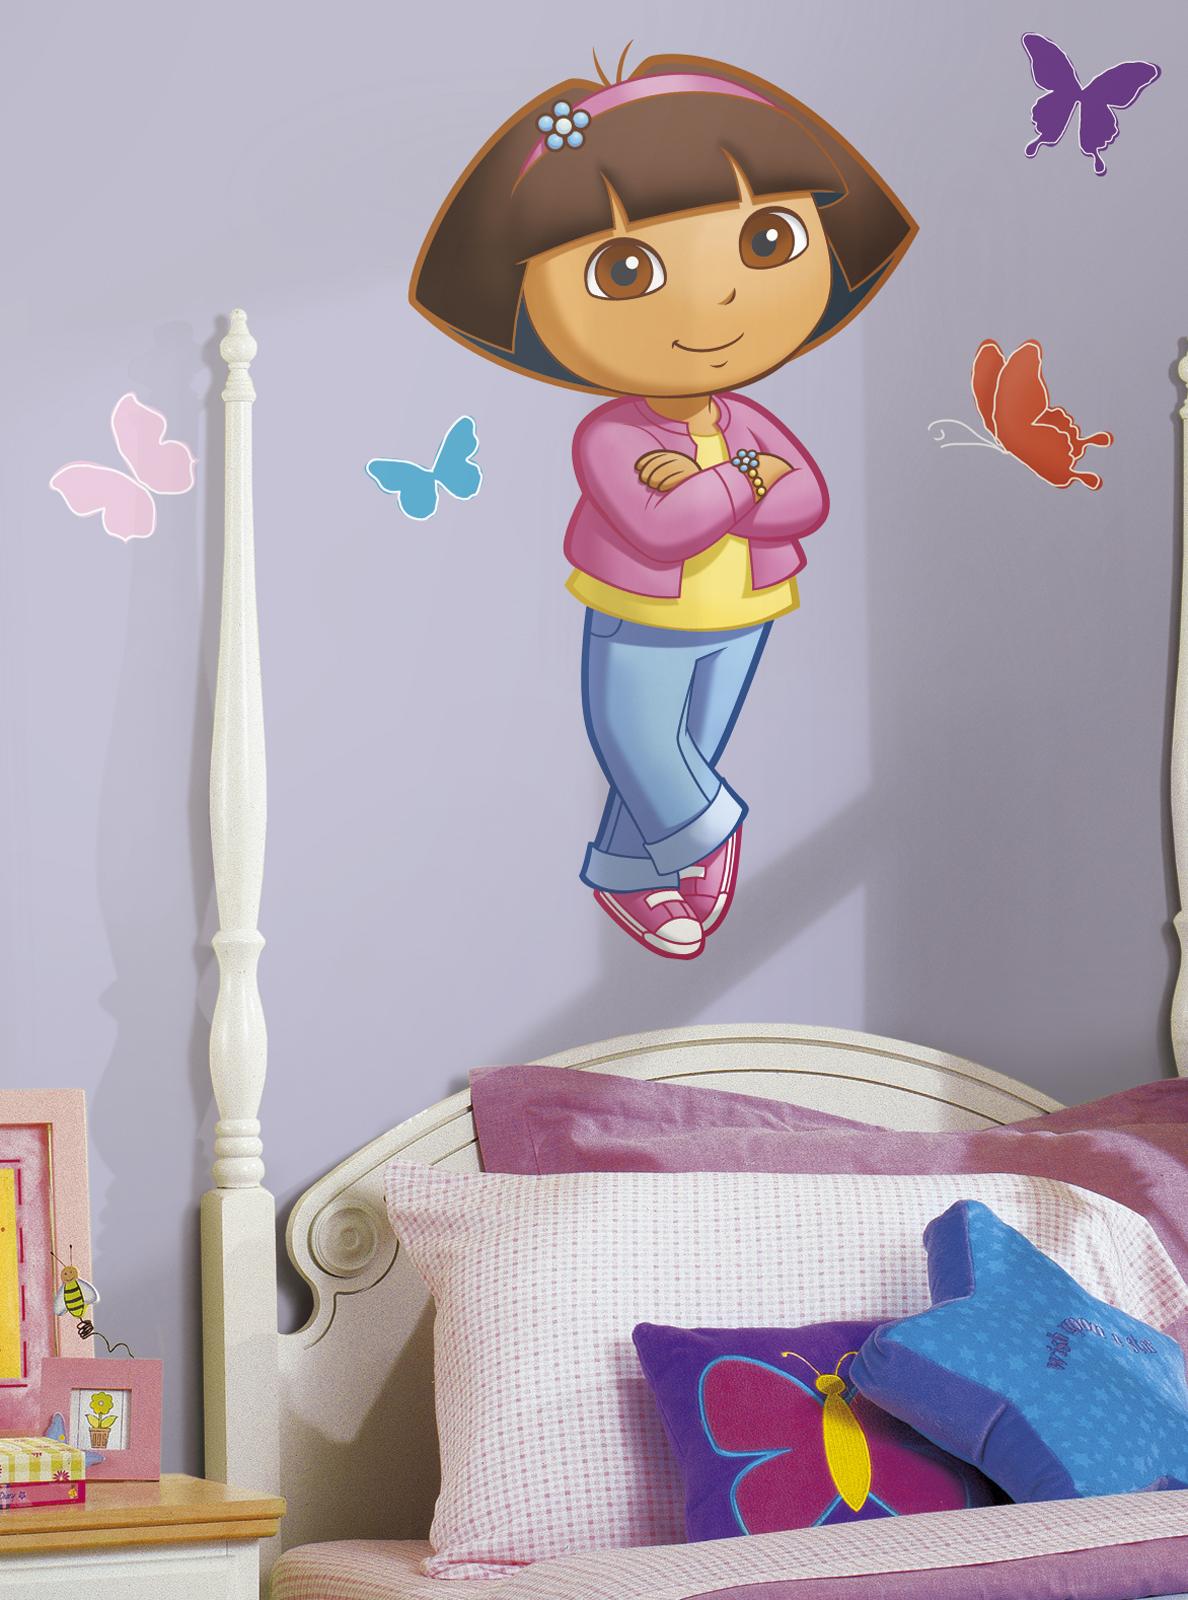 Dora the Explorer Wall Decals